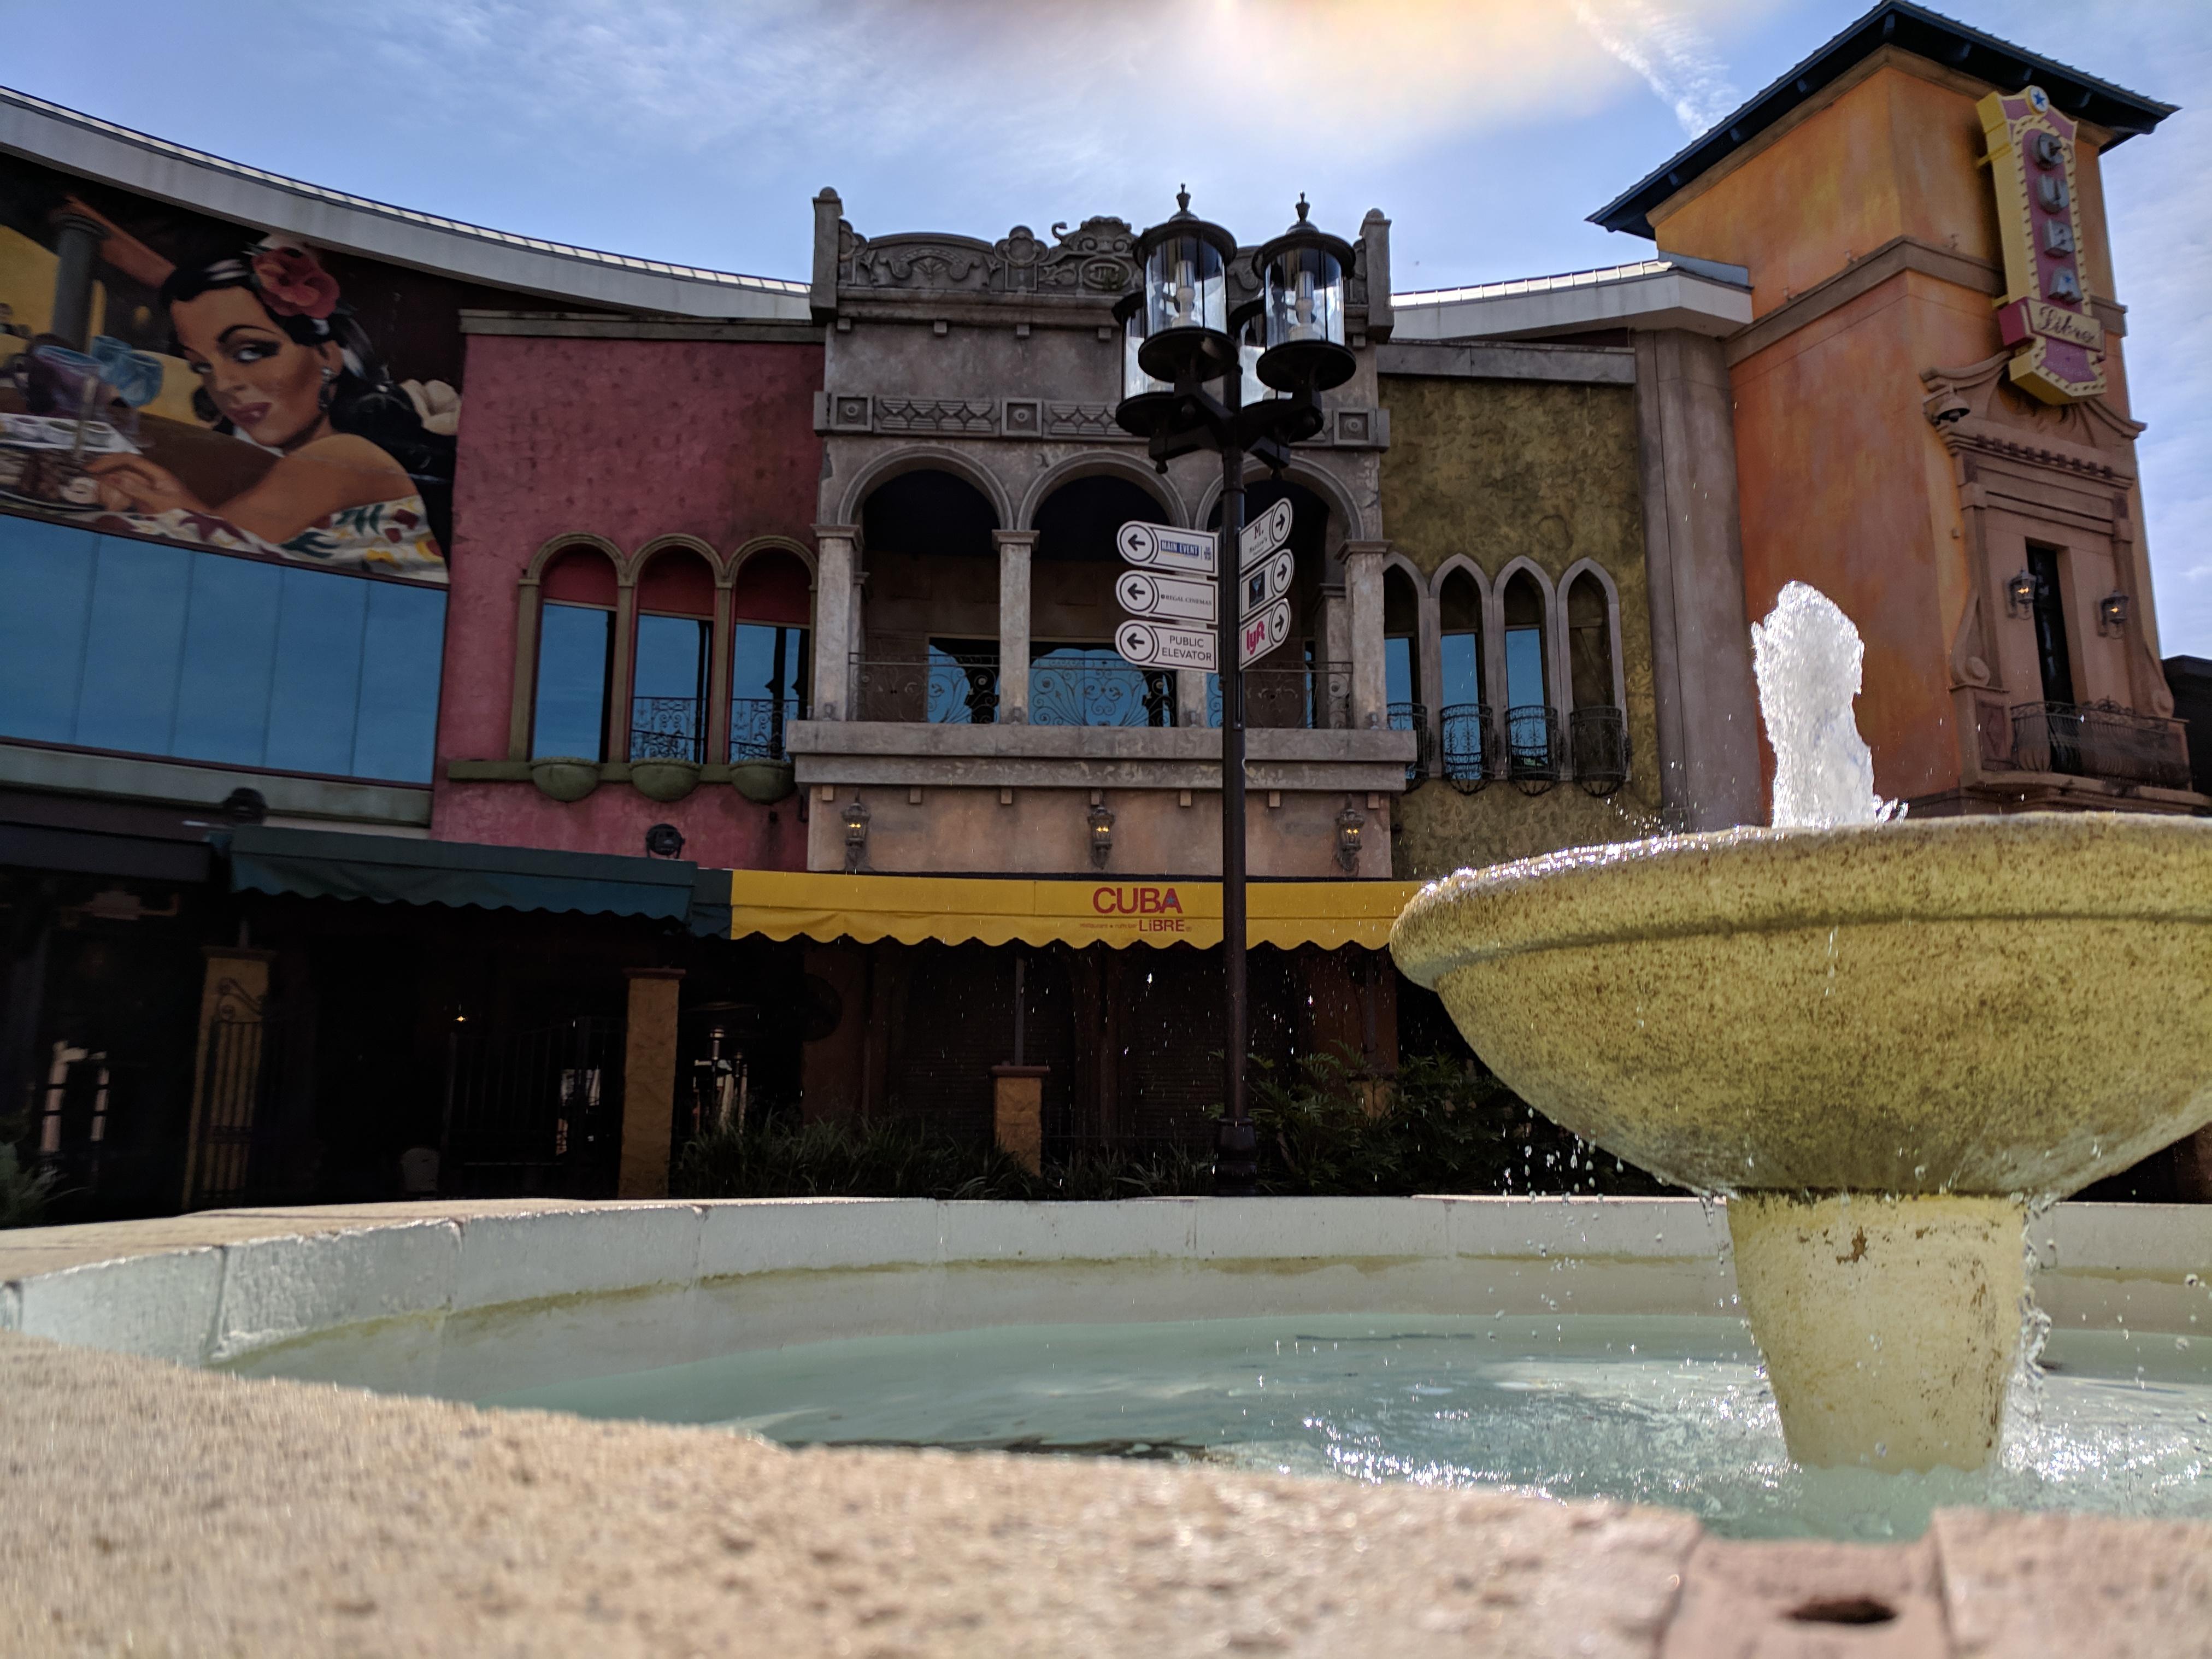 Pointe Orlando: An I-Drive gem for tourists and locals